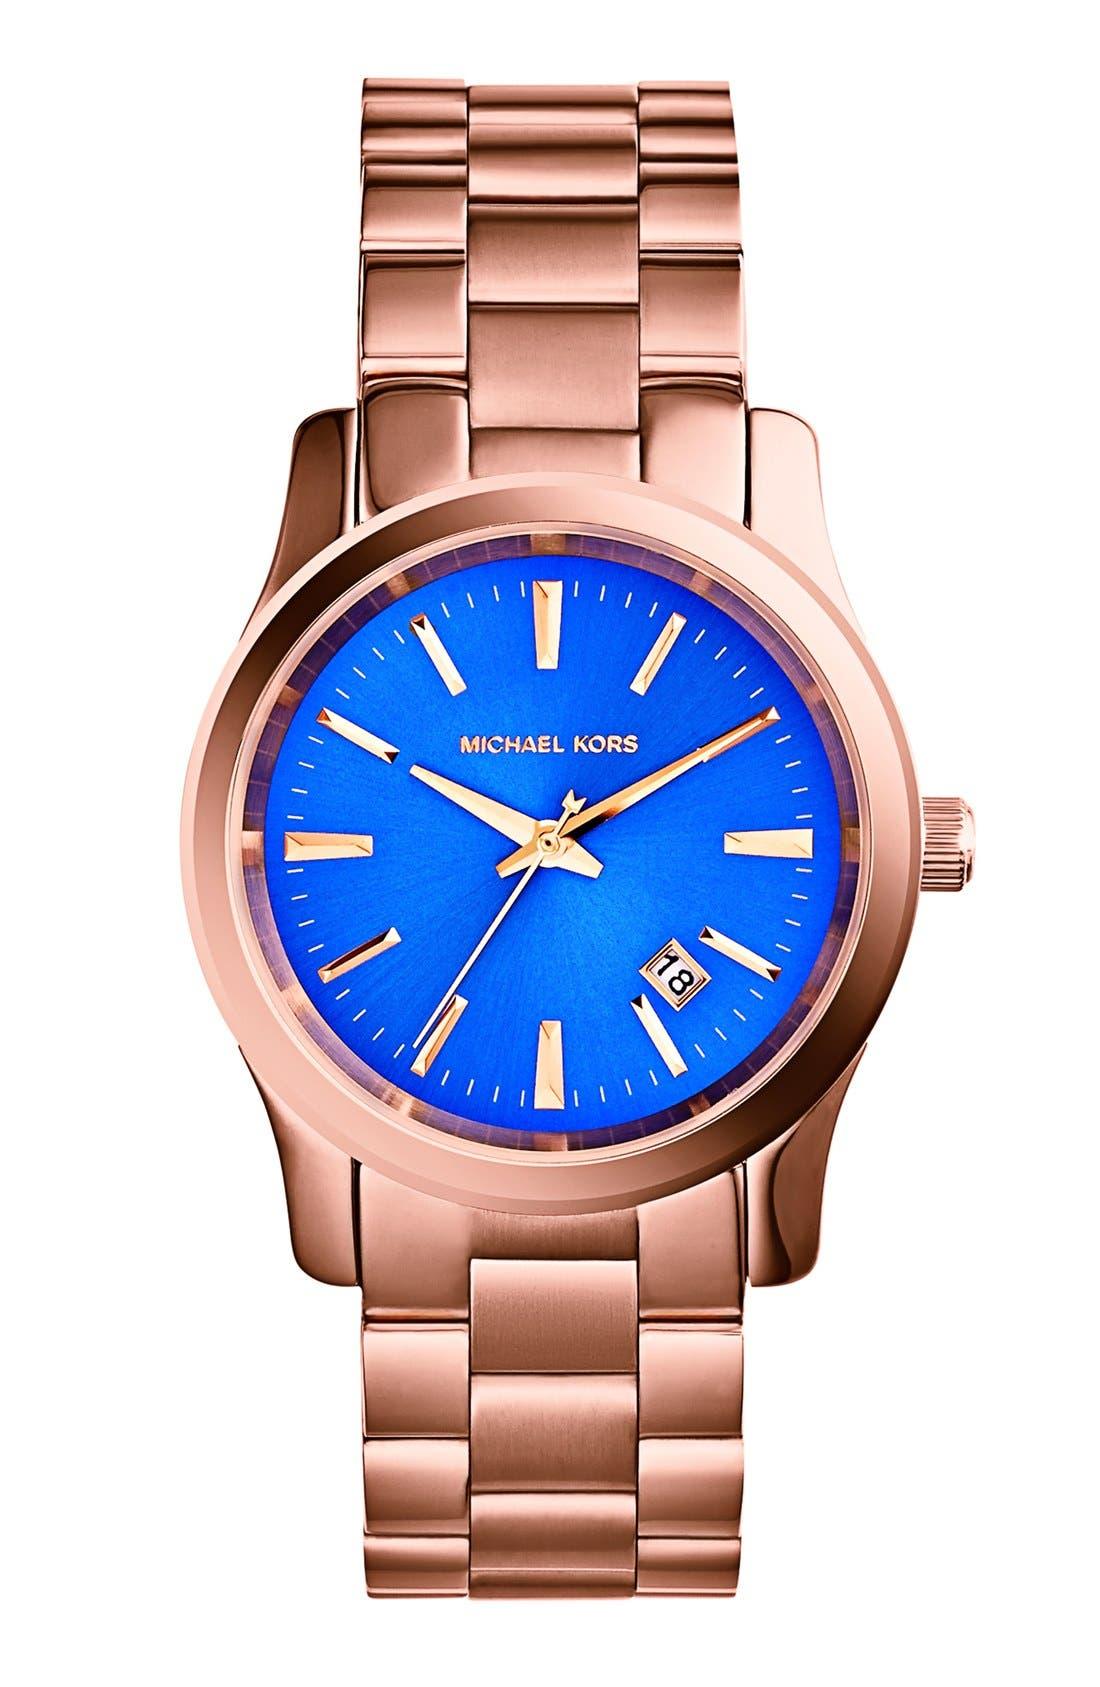 Main Image - Michael Kors 'Runway' Round Bracelet Watch, 38mm